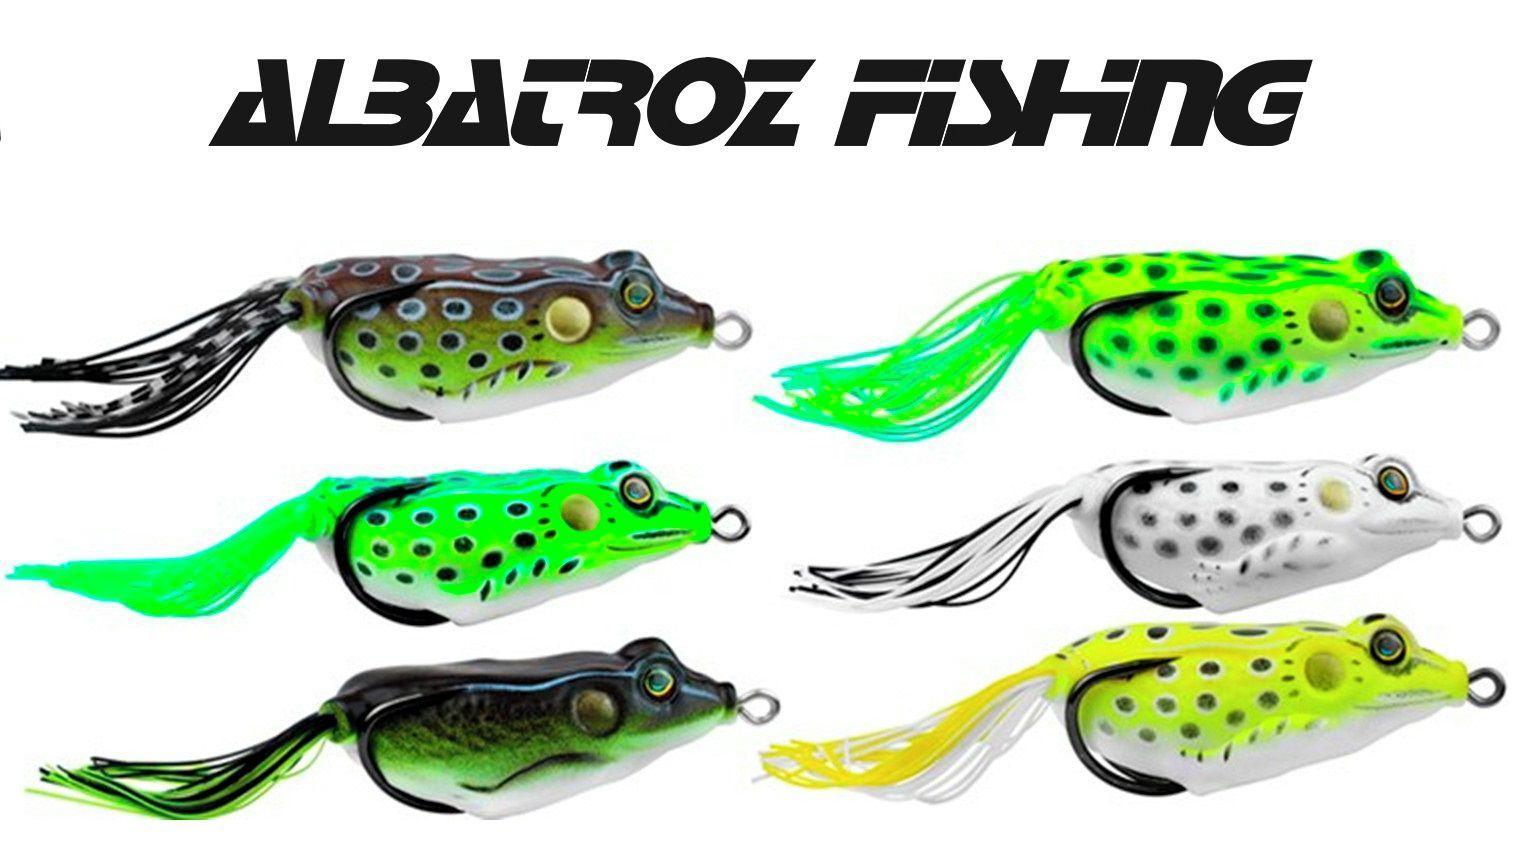 Isca Artificial Albatroz Fishing Top Frog Xy-10 - 6cm (18g) - Várias Cores